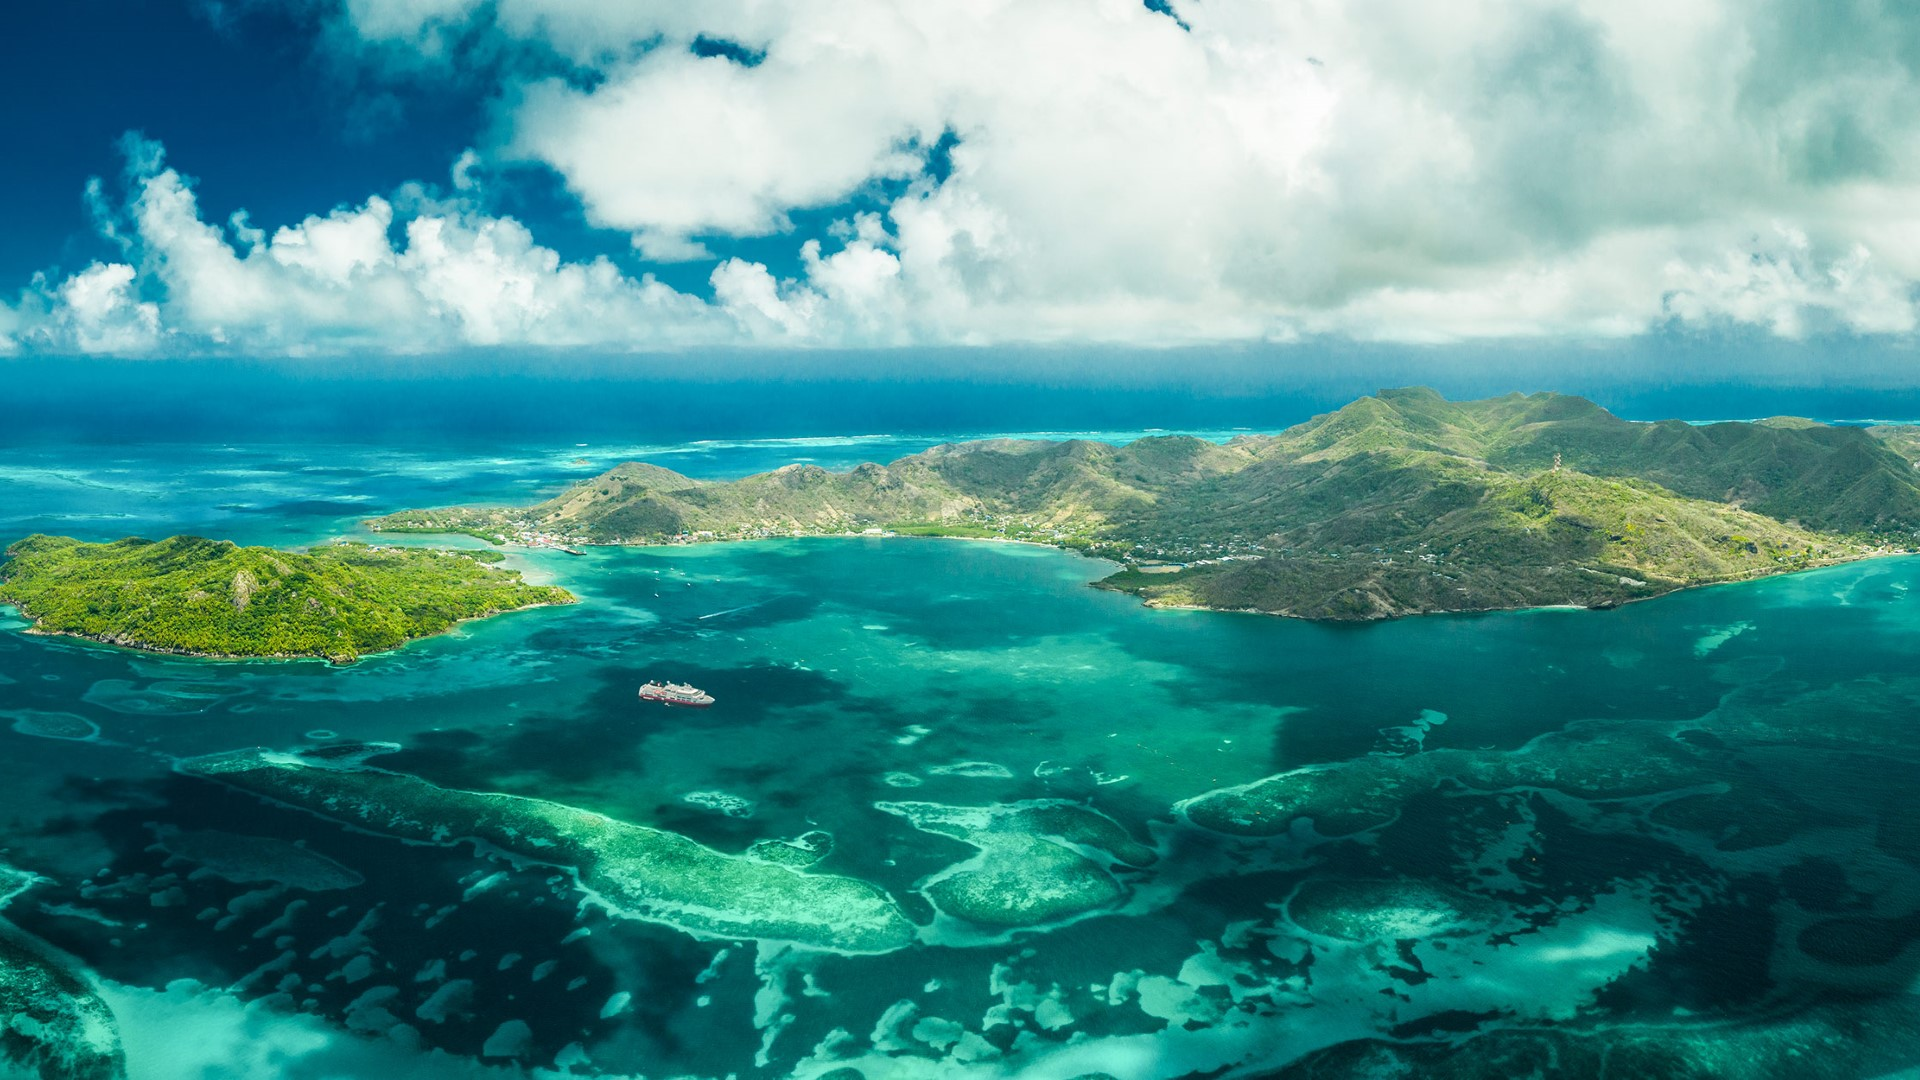 day-7_isla-de-providencia_colombia_aerial-view_dan-avila